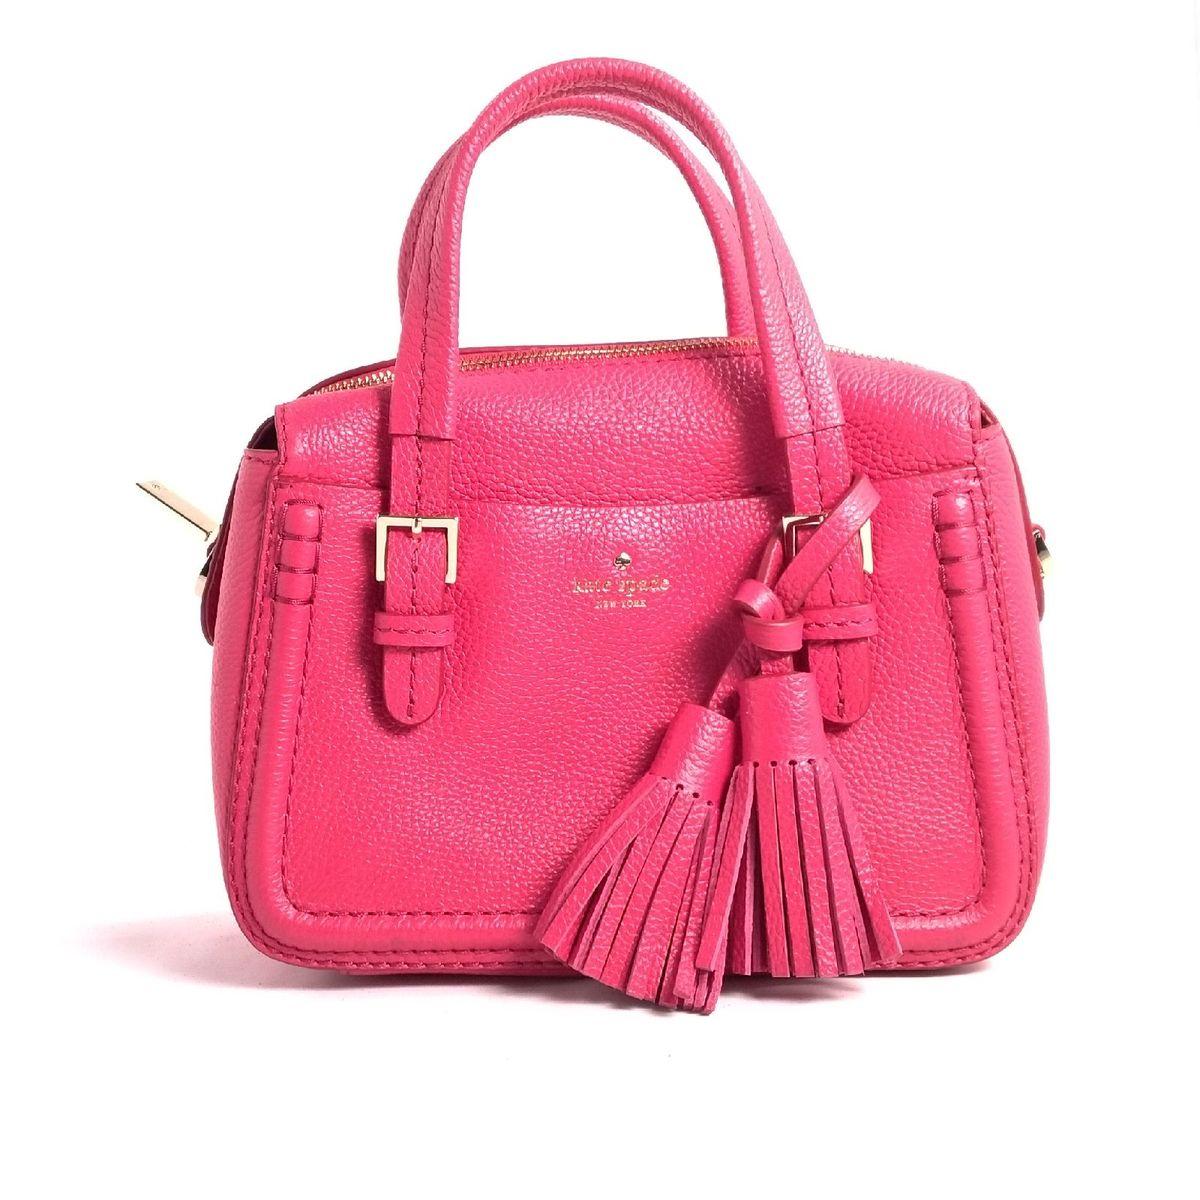 bolsa rosa pink transversal - ombro kate spade